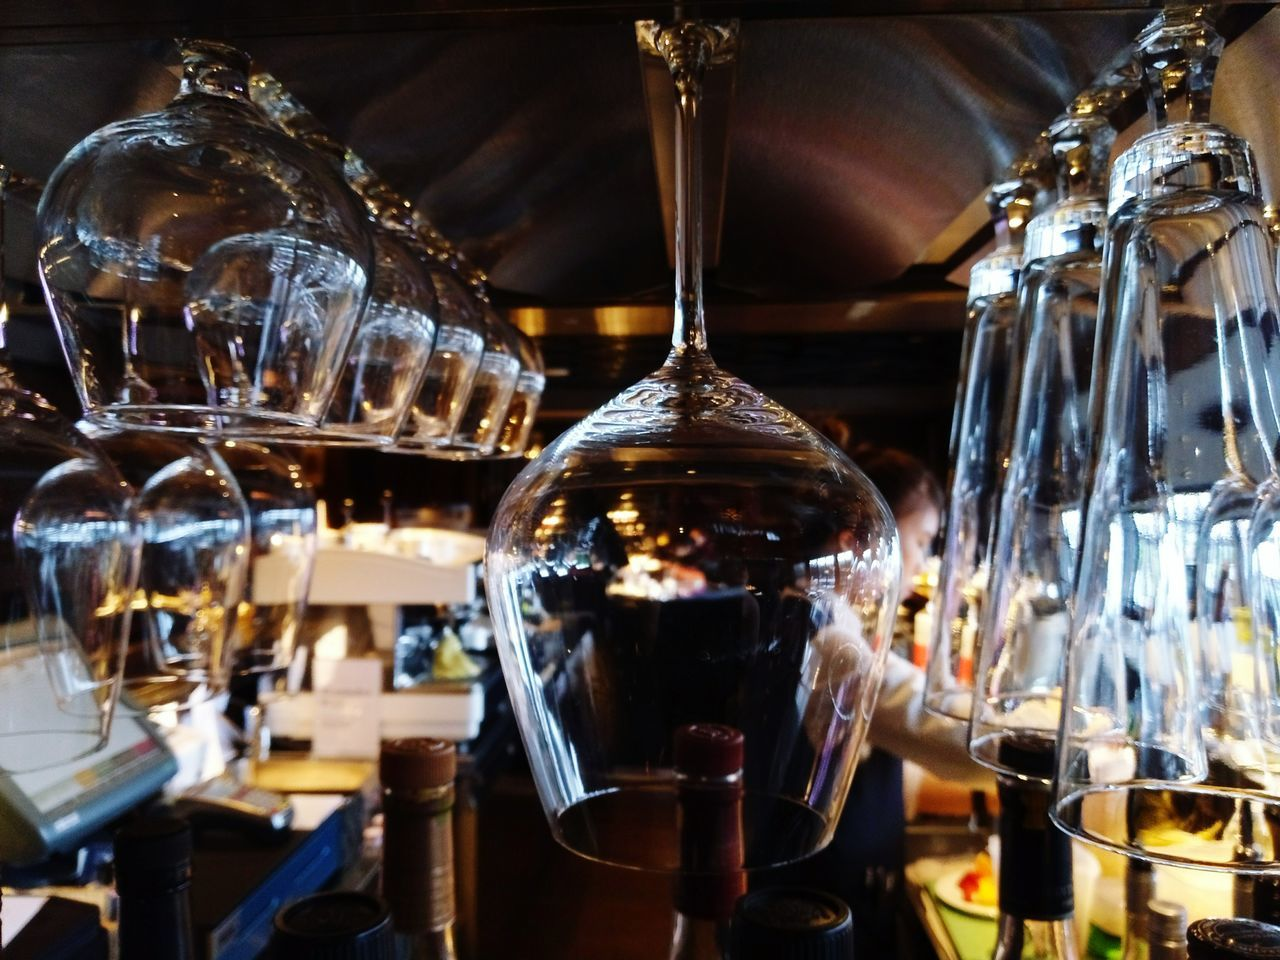 Lieblingsteil Bar - Drink Establishment Wineglass Bar Counter Drinking Glass Crystal Glassware Wine Glass Mini Bar Attack Wine Alcohol Drink